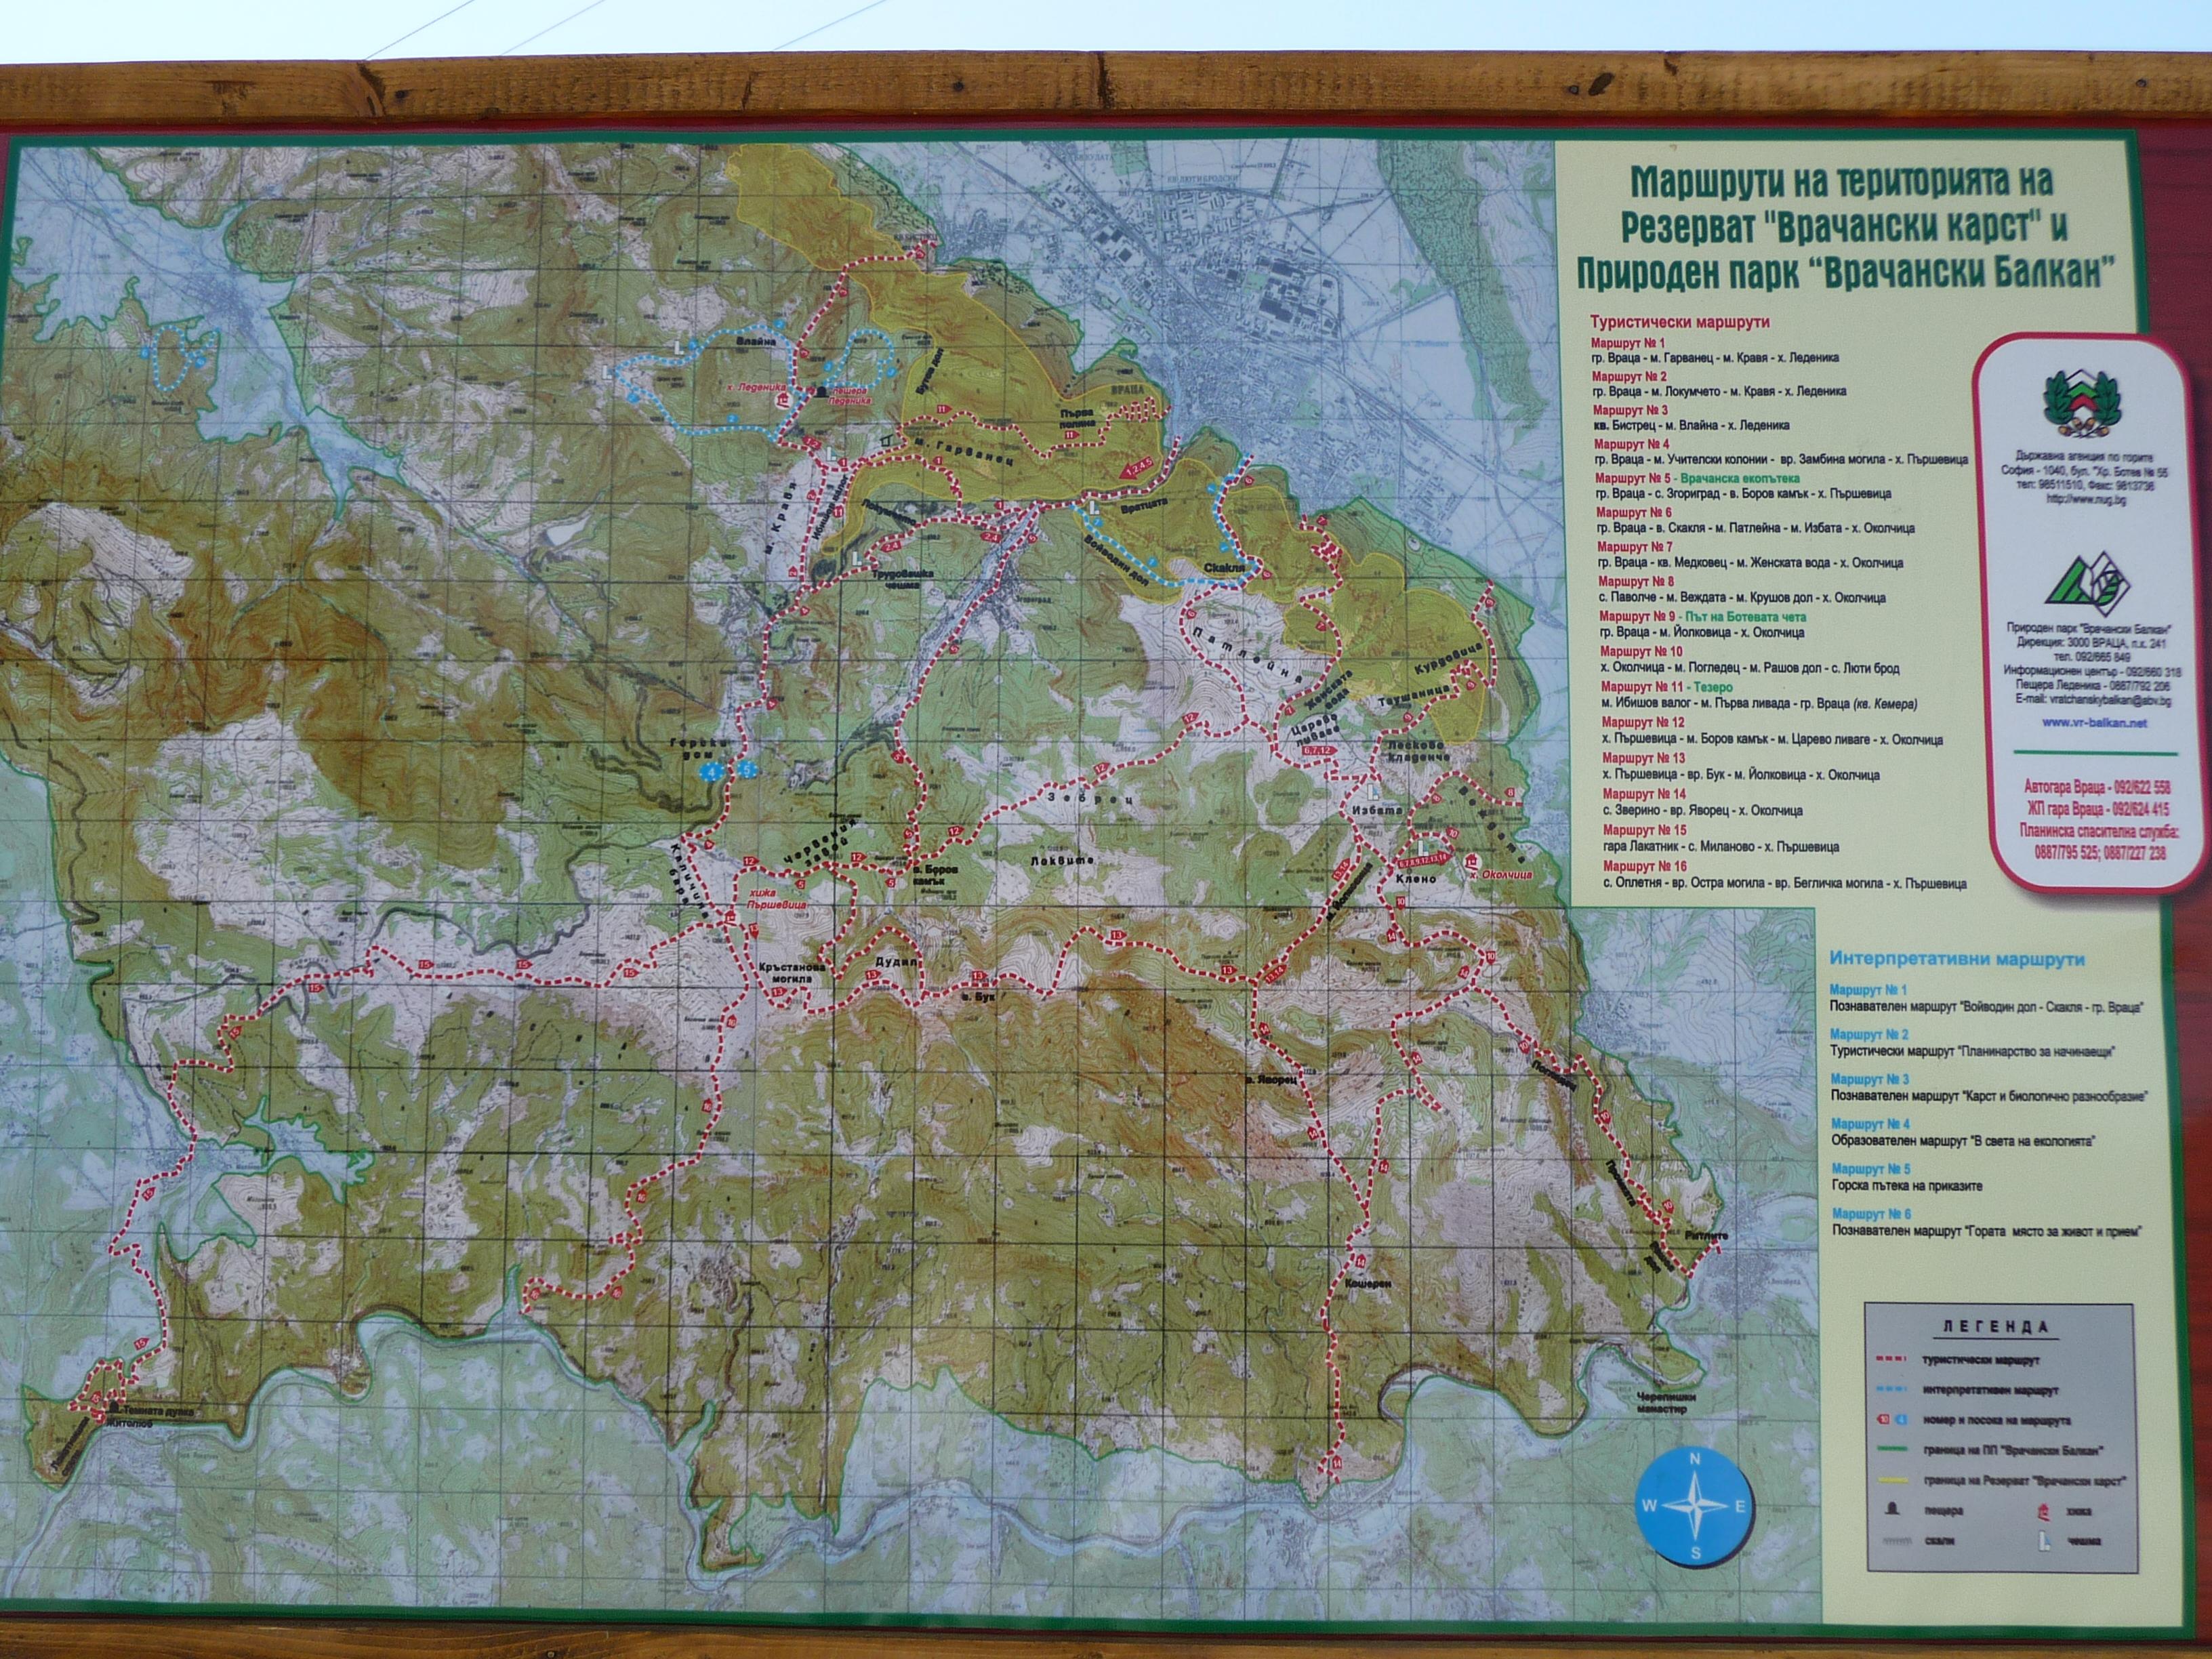 Карта врачански балкан, Враца, Згориград - пълна - Туризъм и природа